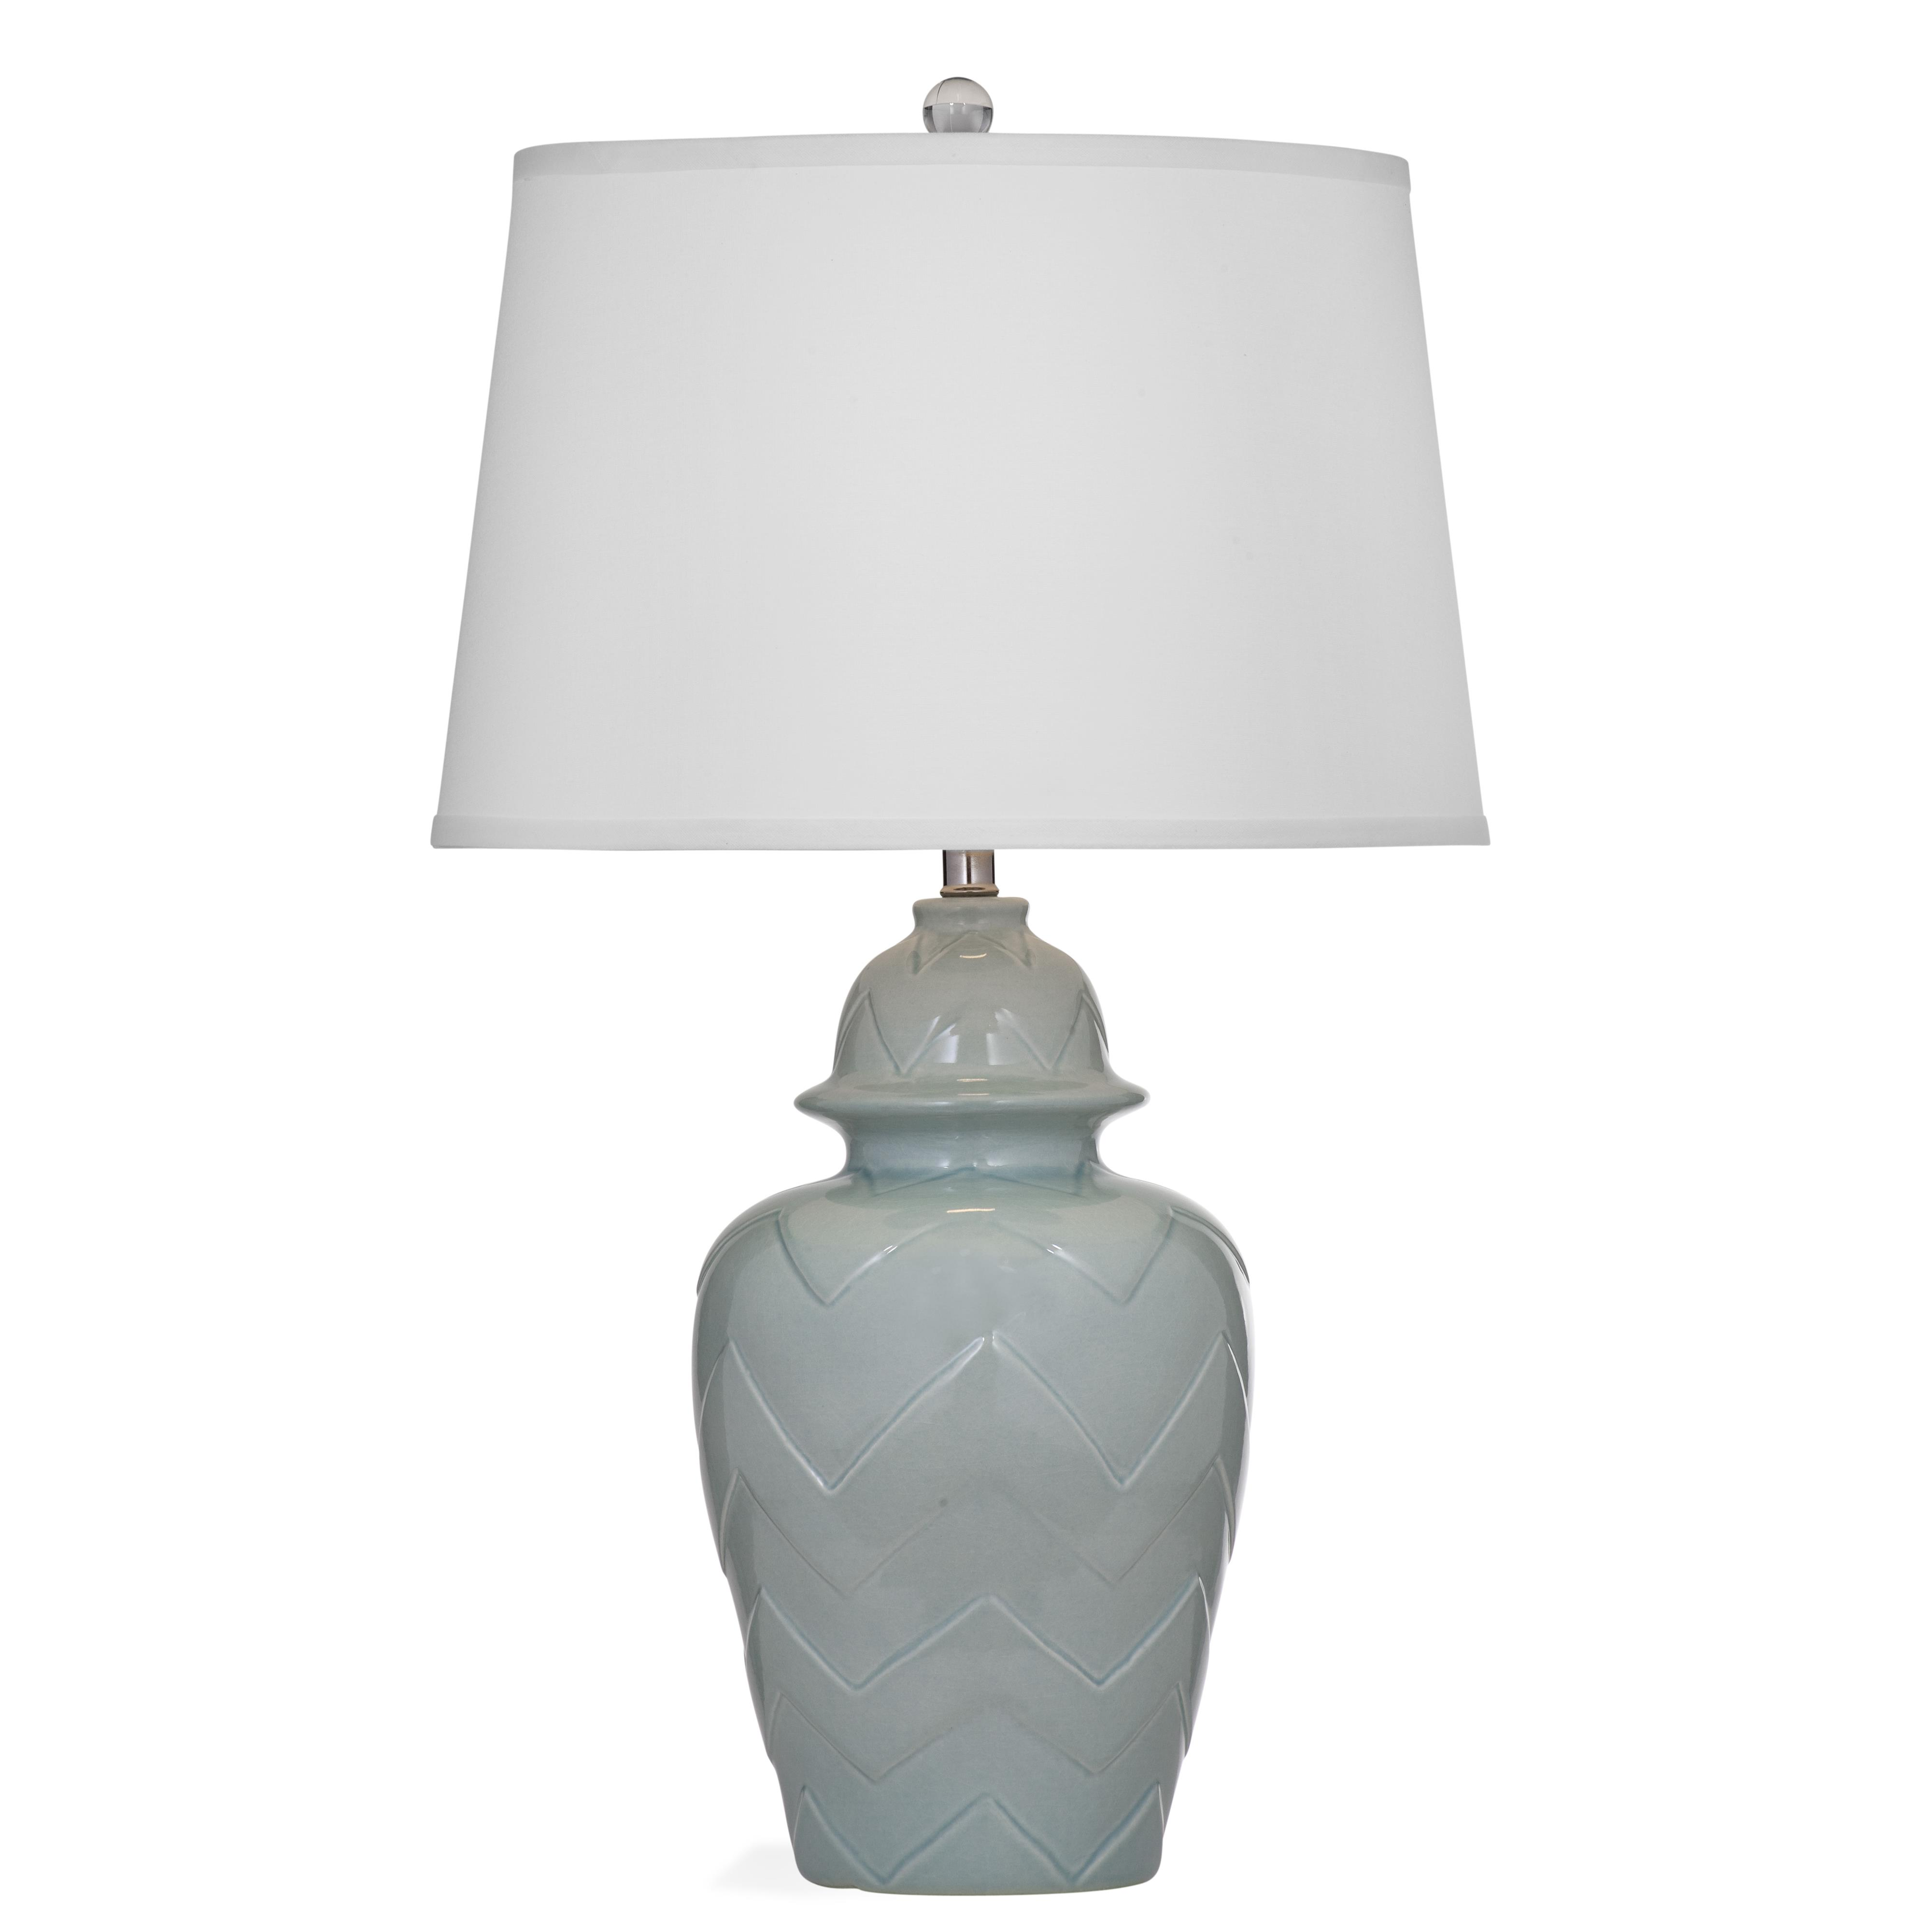 Bassett Furniture Milford Ct: Bassett Mirror Old World L3063T Callie Table Lamp